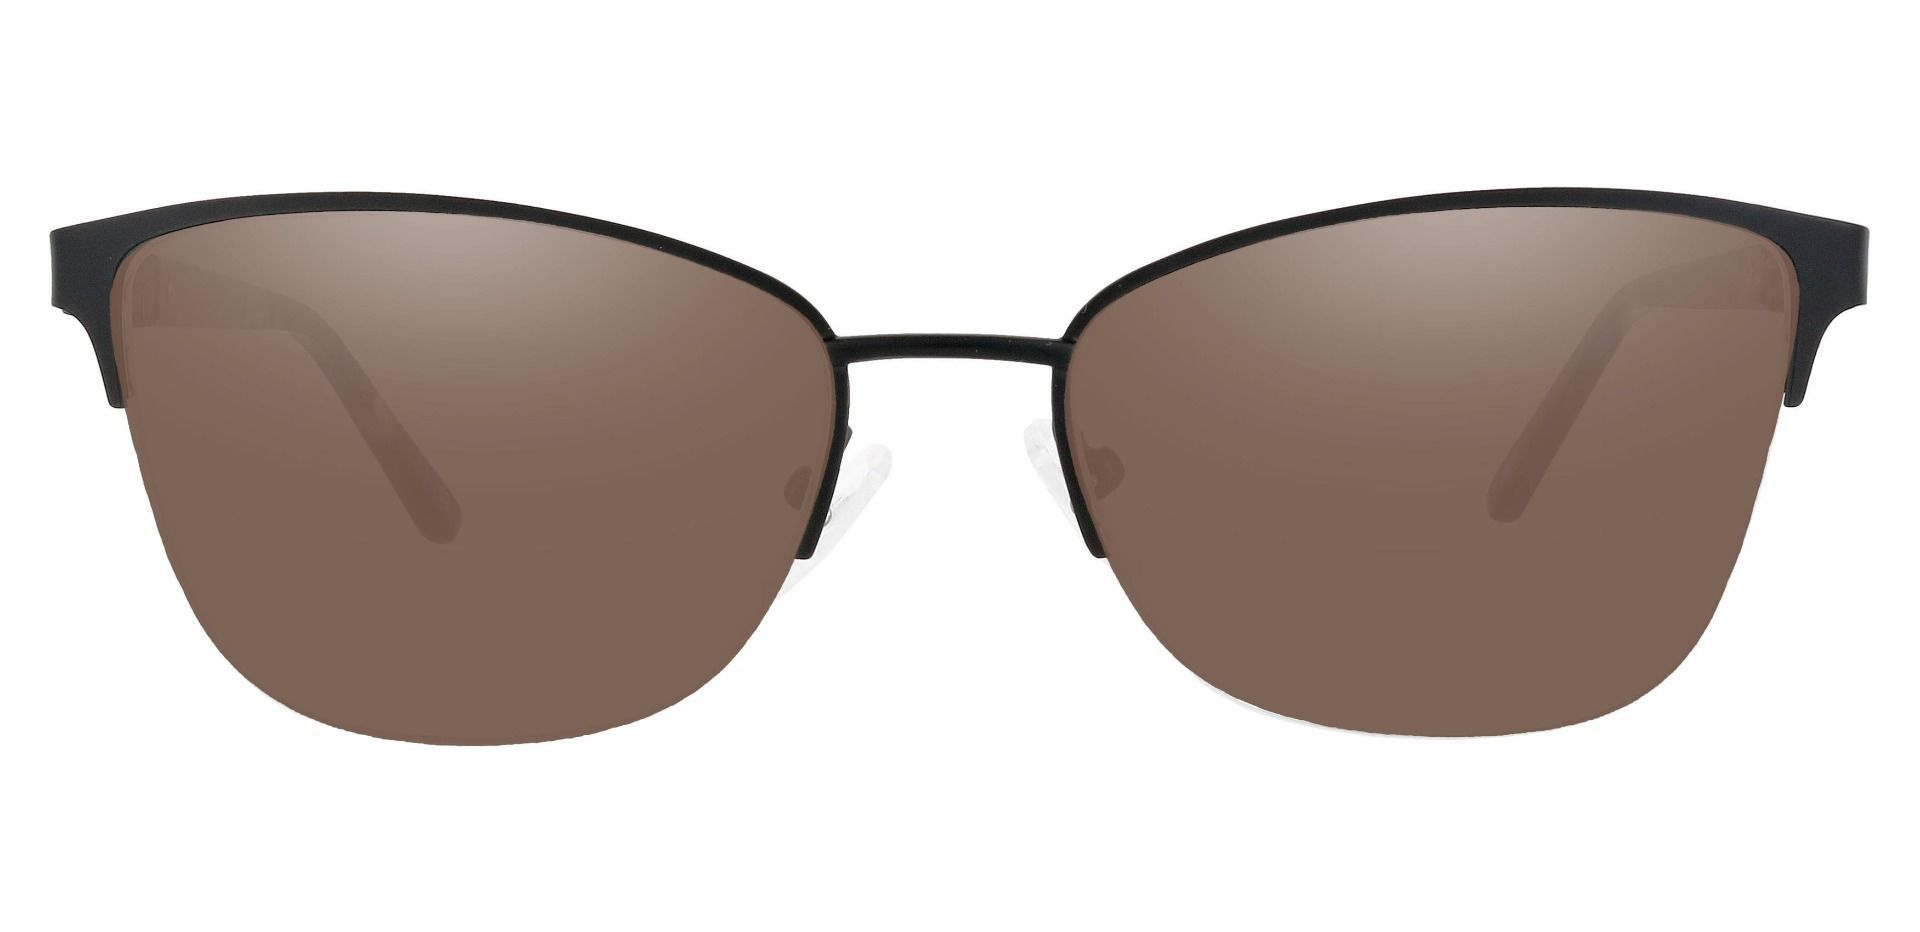 Ballad Cat Eye Prescription Sunglasses - Black Frame With Brown Lenses